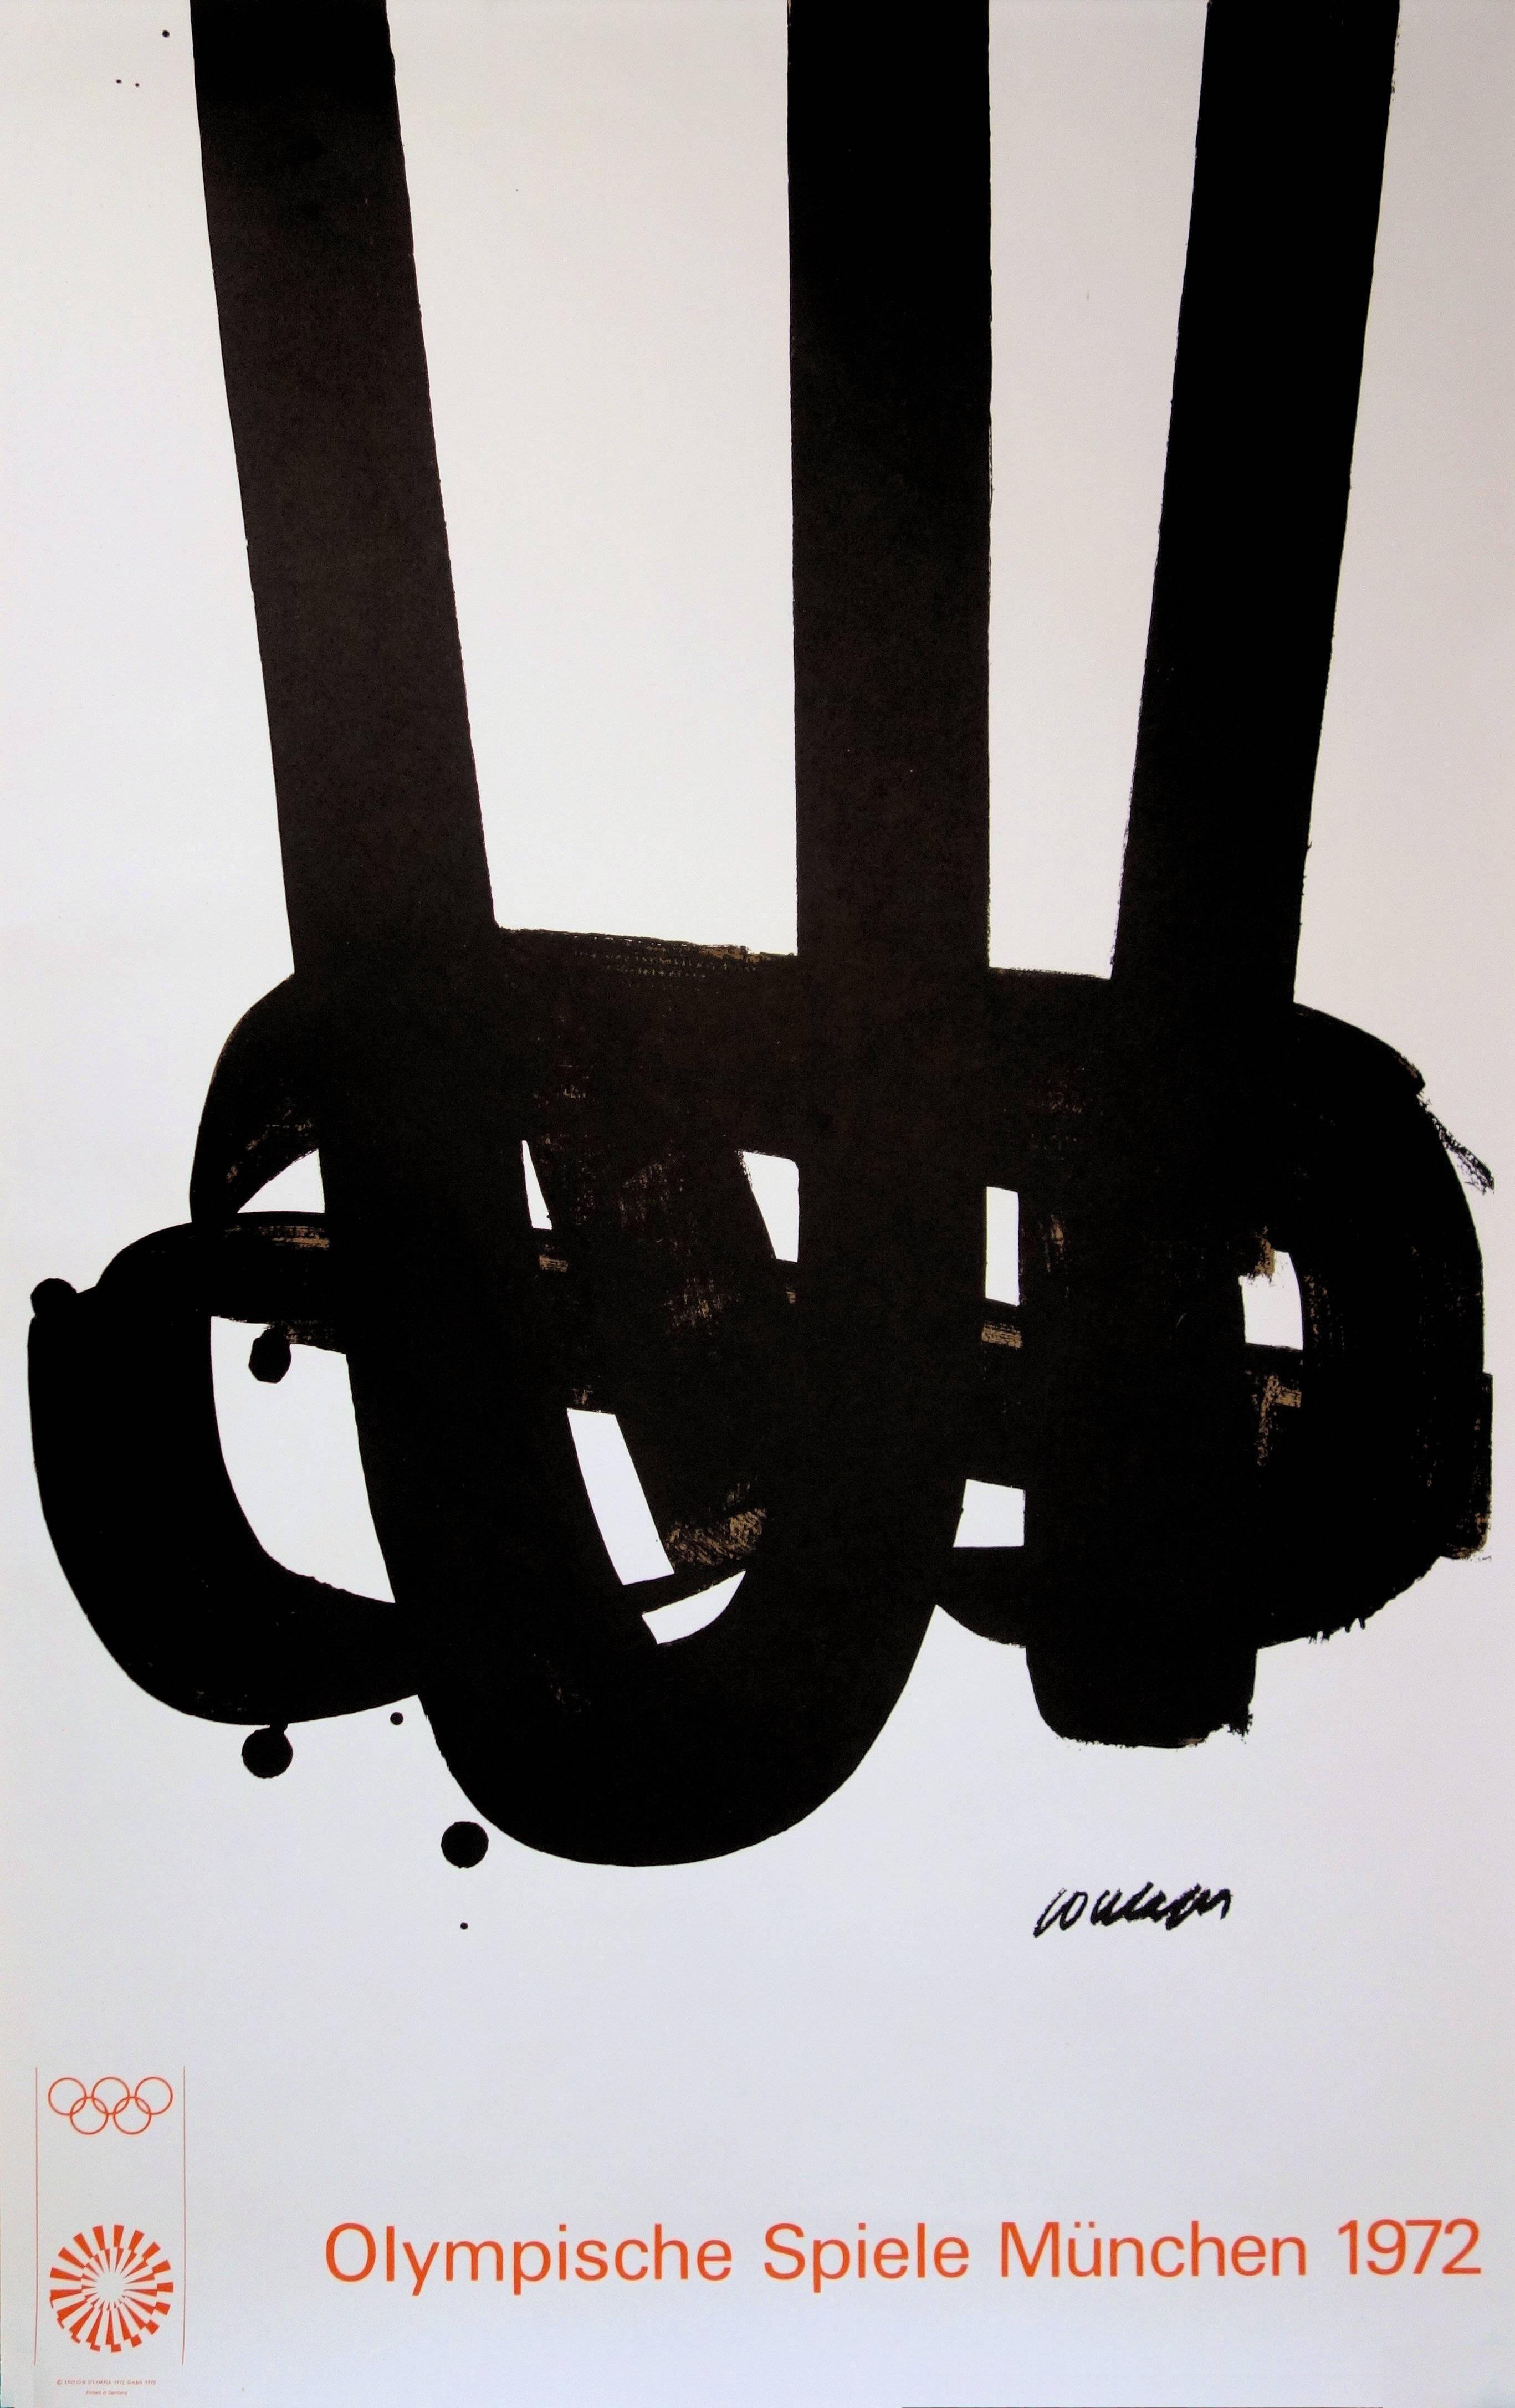 Lithograph n°29 - Original Lithograph (Mourlot - Olympic Games Munich 1972)